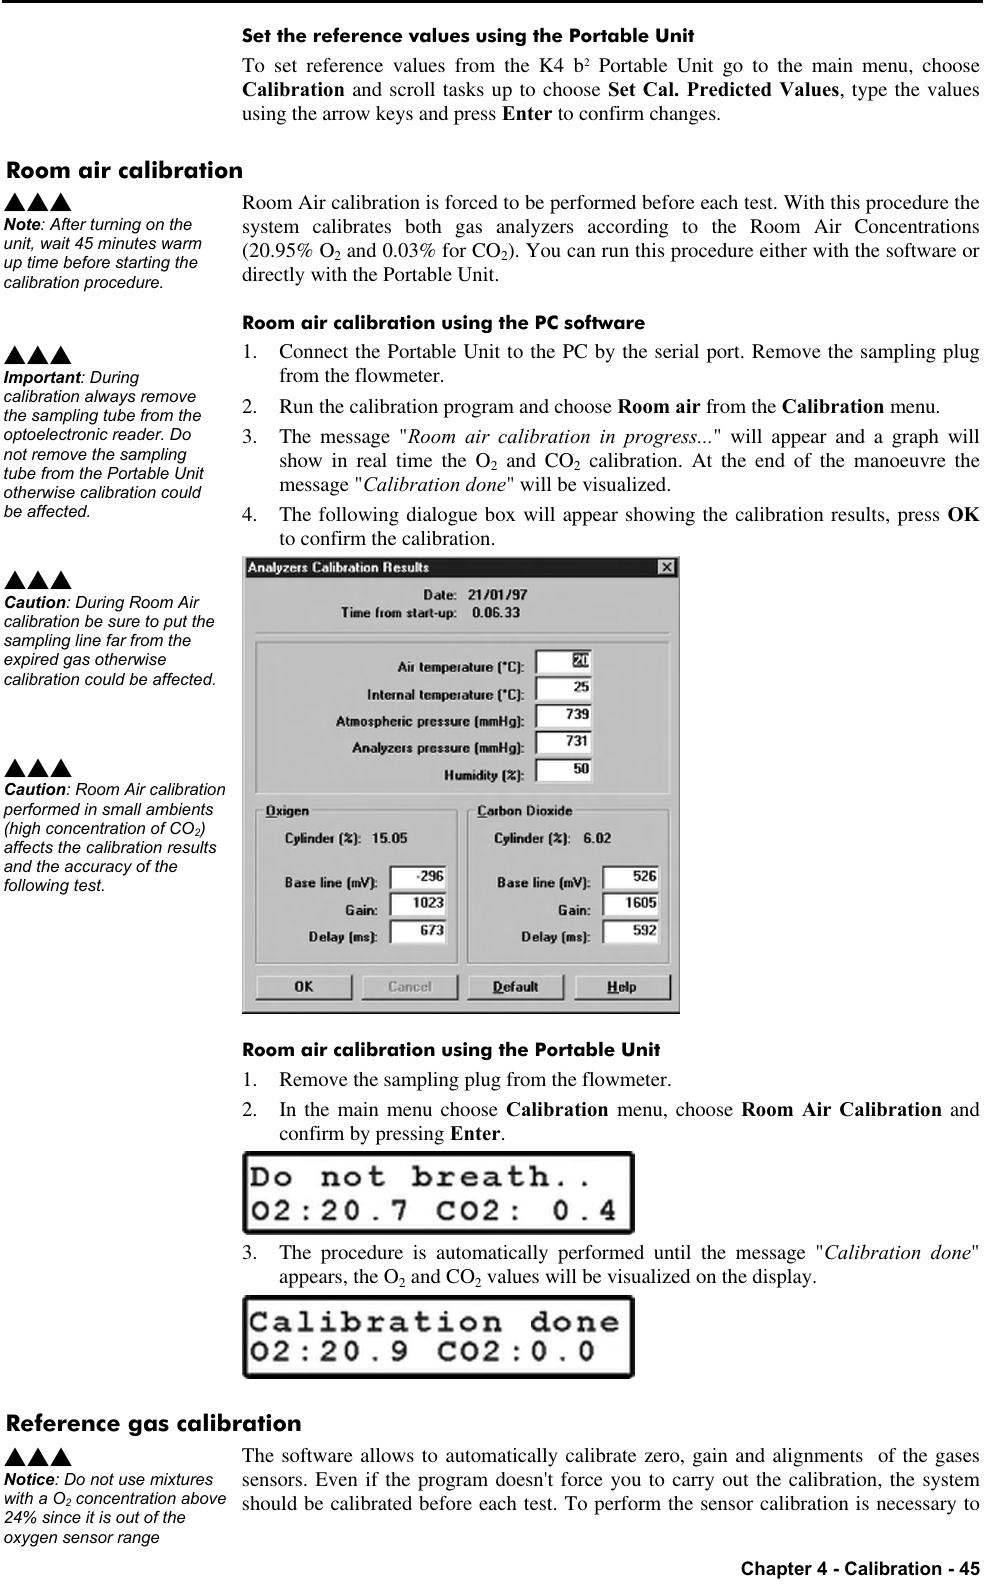 warmup user manual